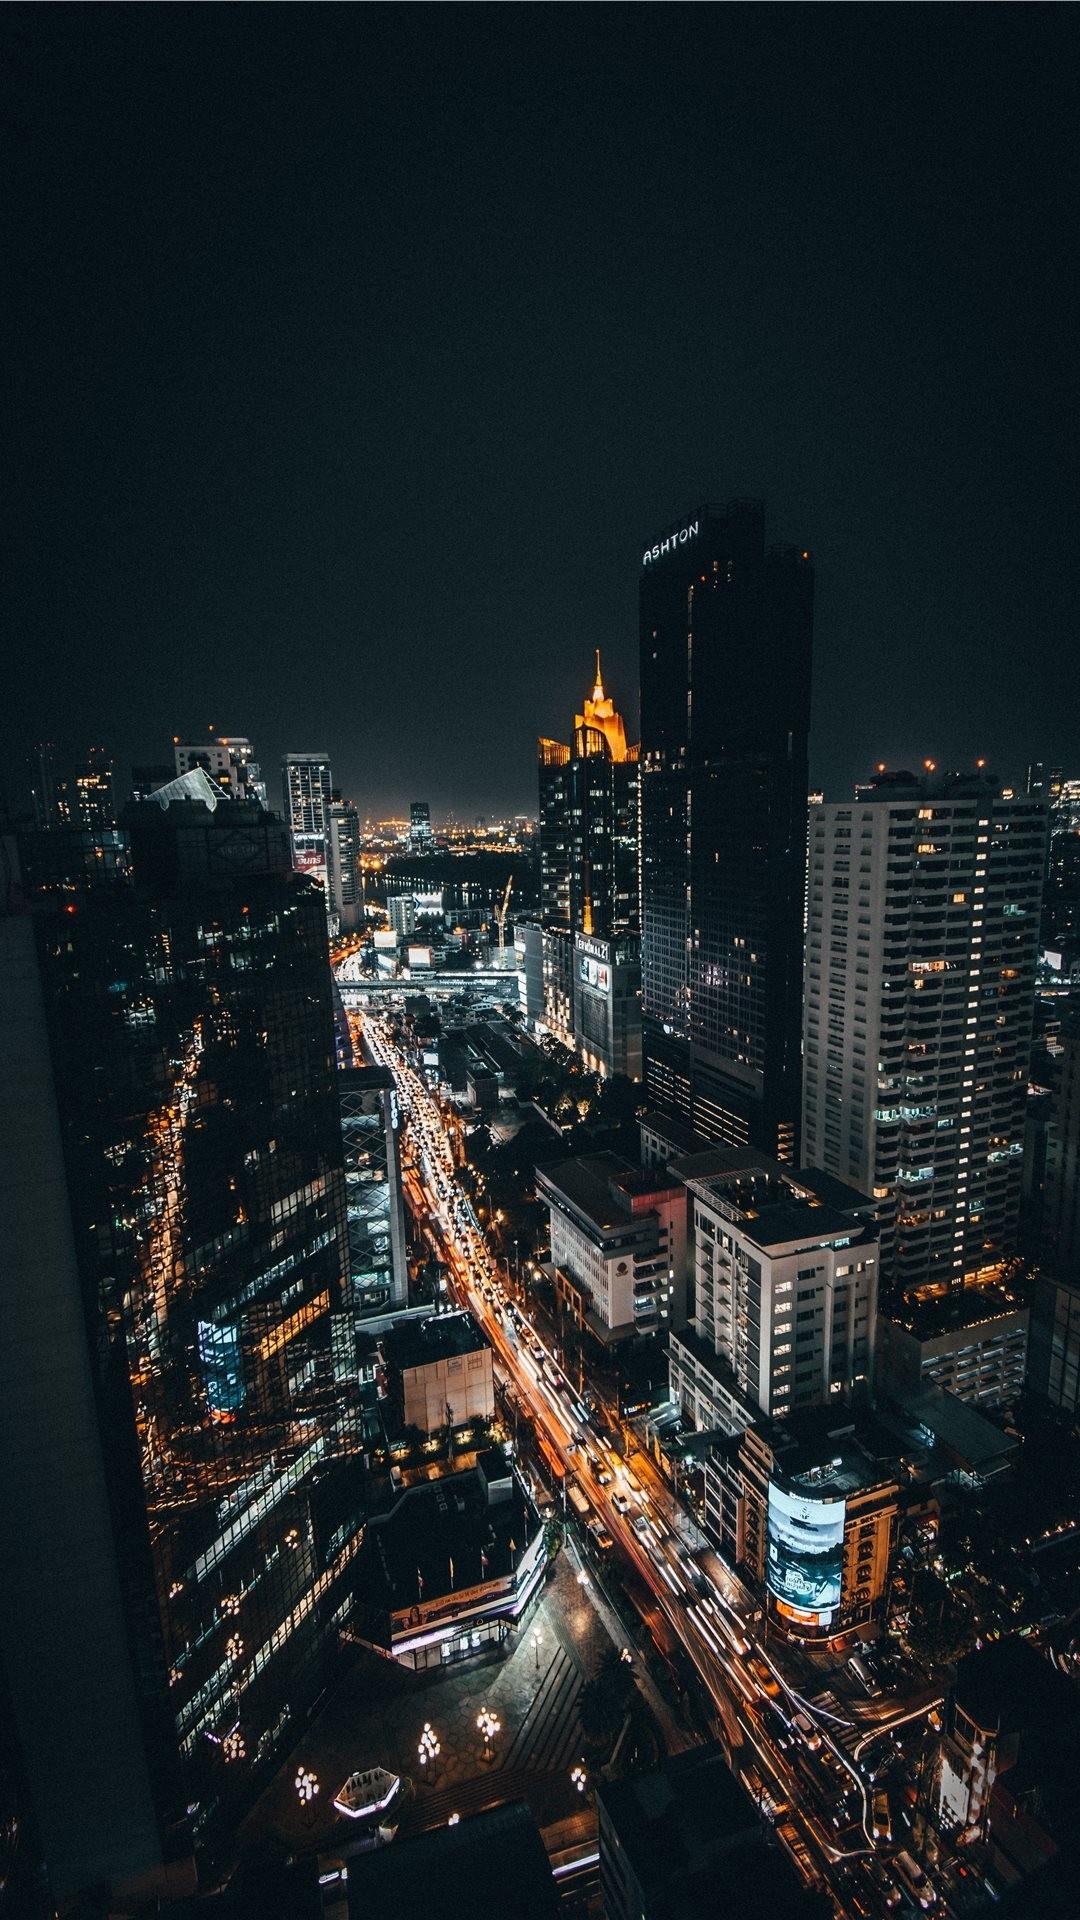 City iphone 8 plus wallpaper